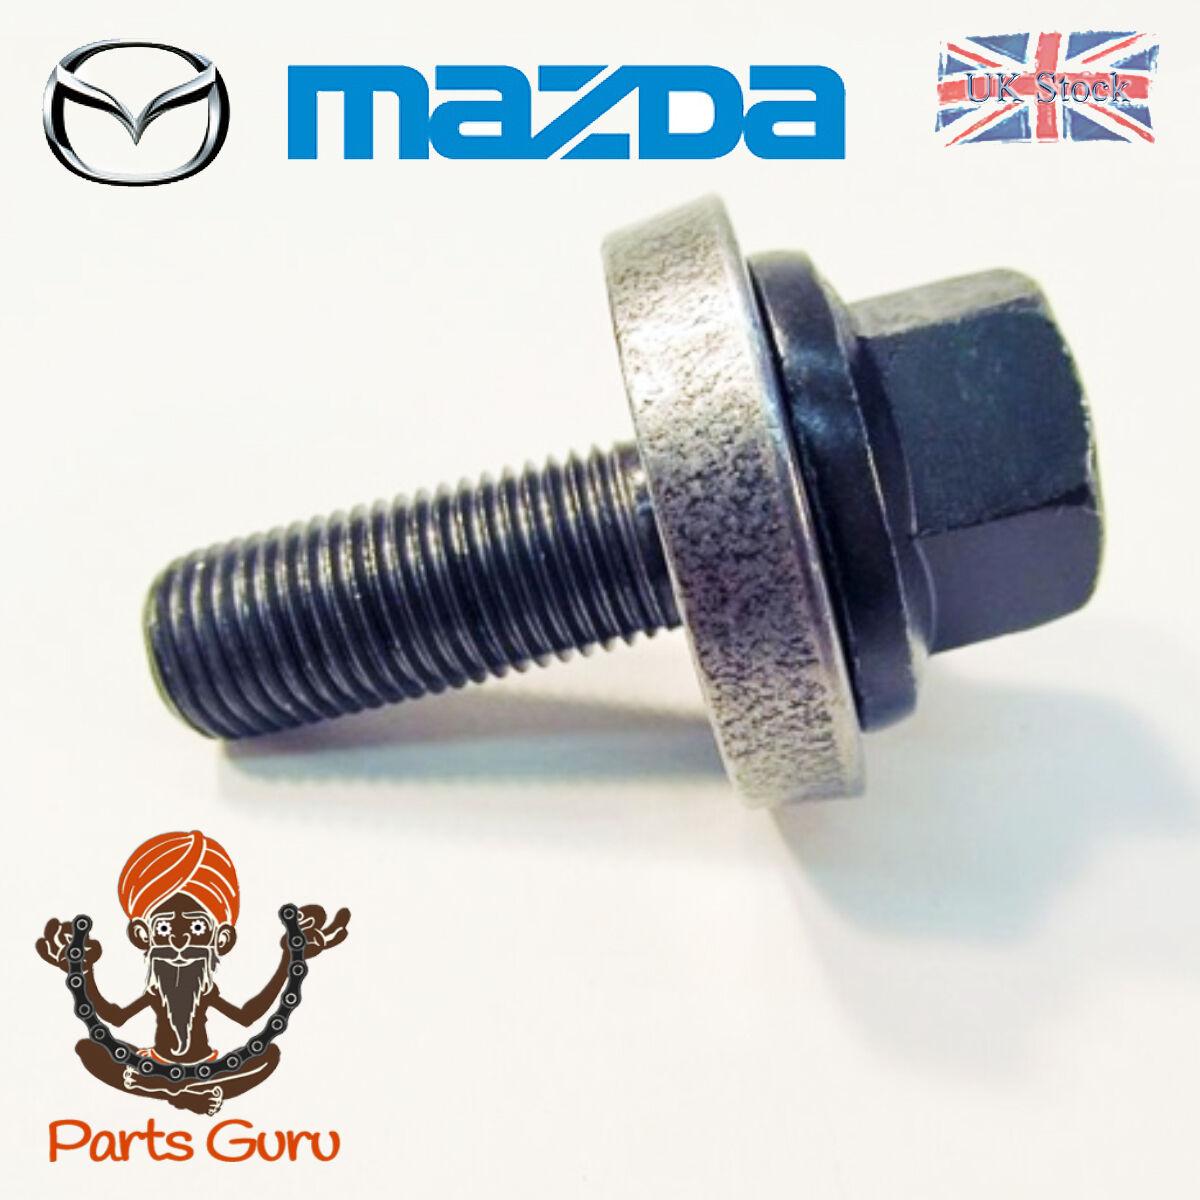 Genuine Mazda LF01-11-406 Crankshaft Pulley Bolt